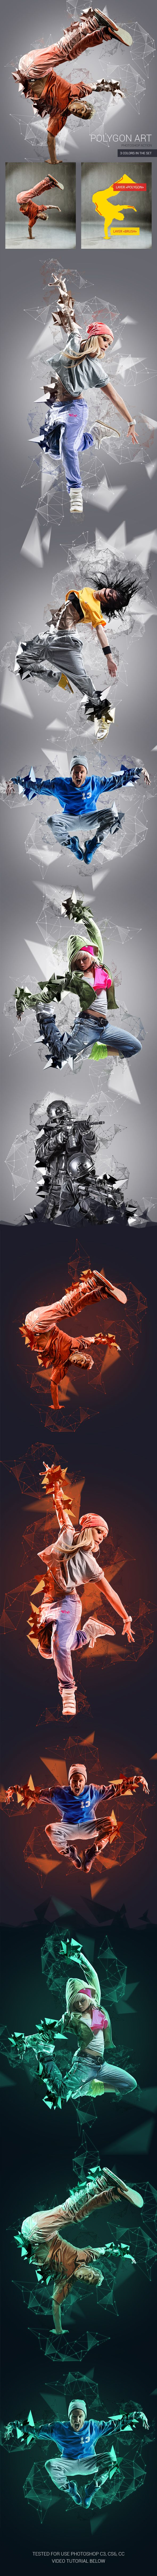 Polygon Art Photoshop Action. Download here: https://graphicriver.net/item/polygon-art-photoshop-action/17372615?ref=ksioks